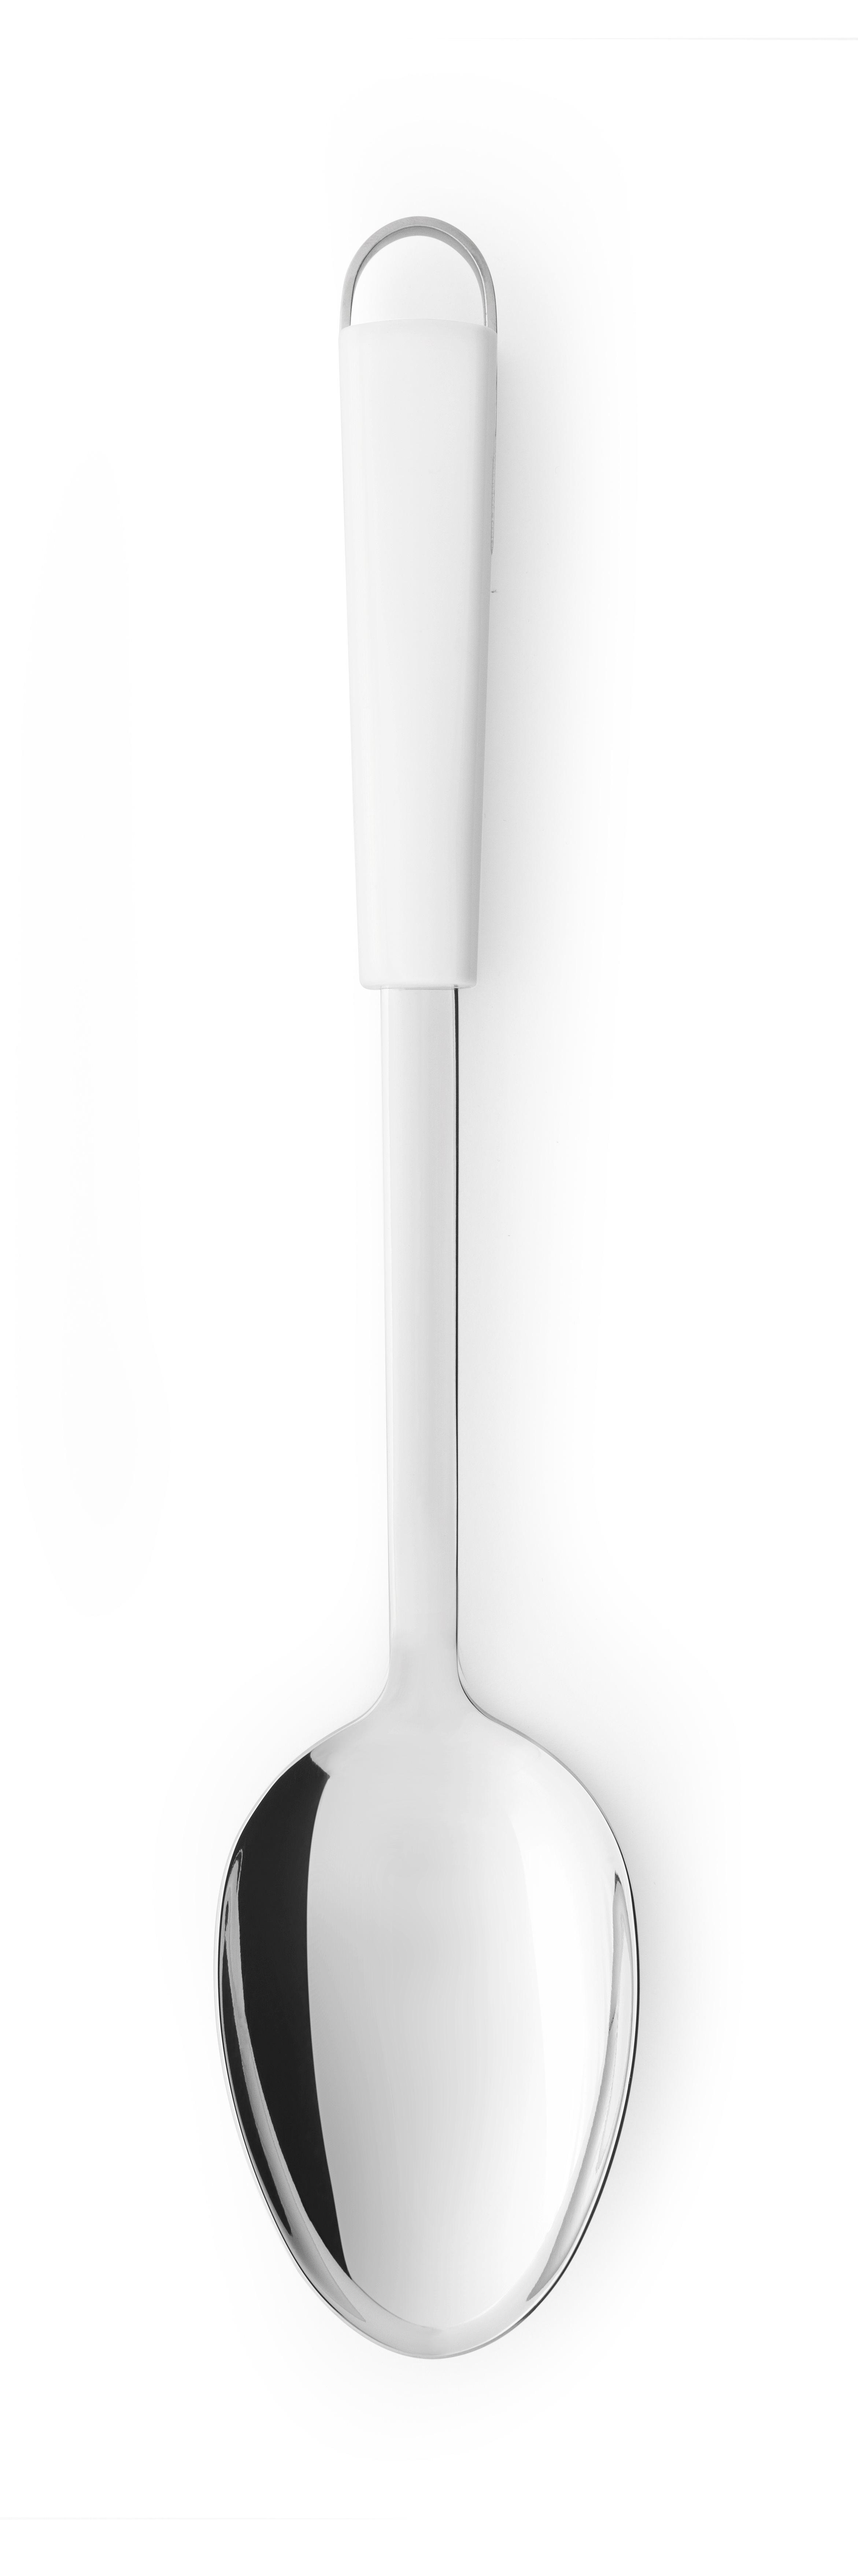 BRABANTIA Κουτάλα Λαχανικών Ανοξείδωτη με Λευκή Λαβή ESSENTIAL LINE - 080.4004/21